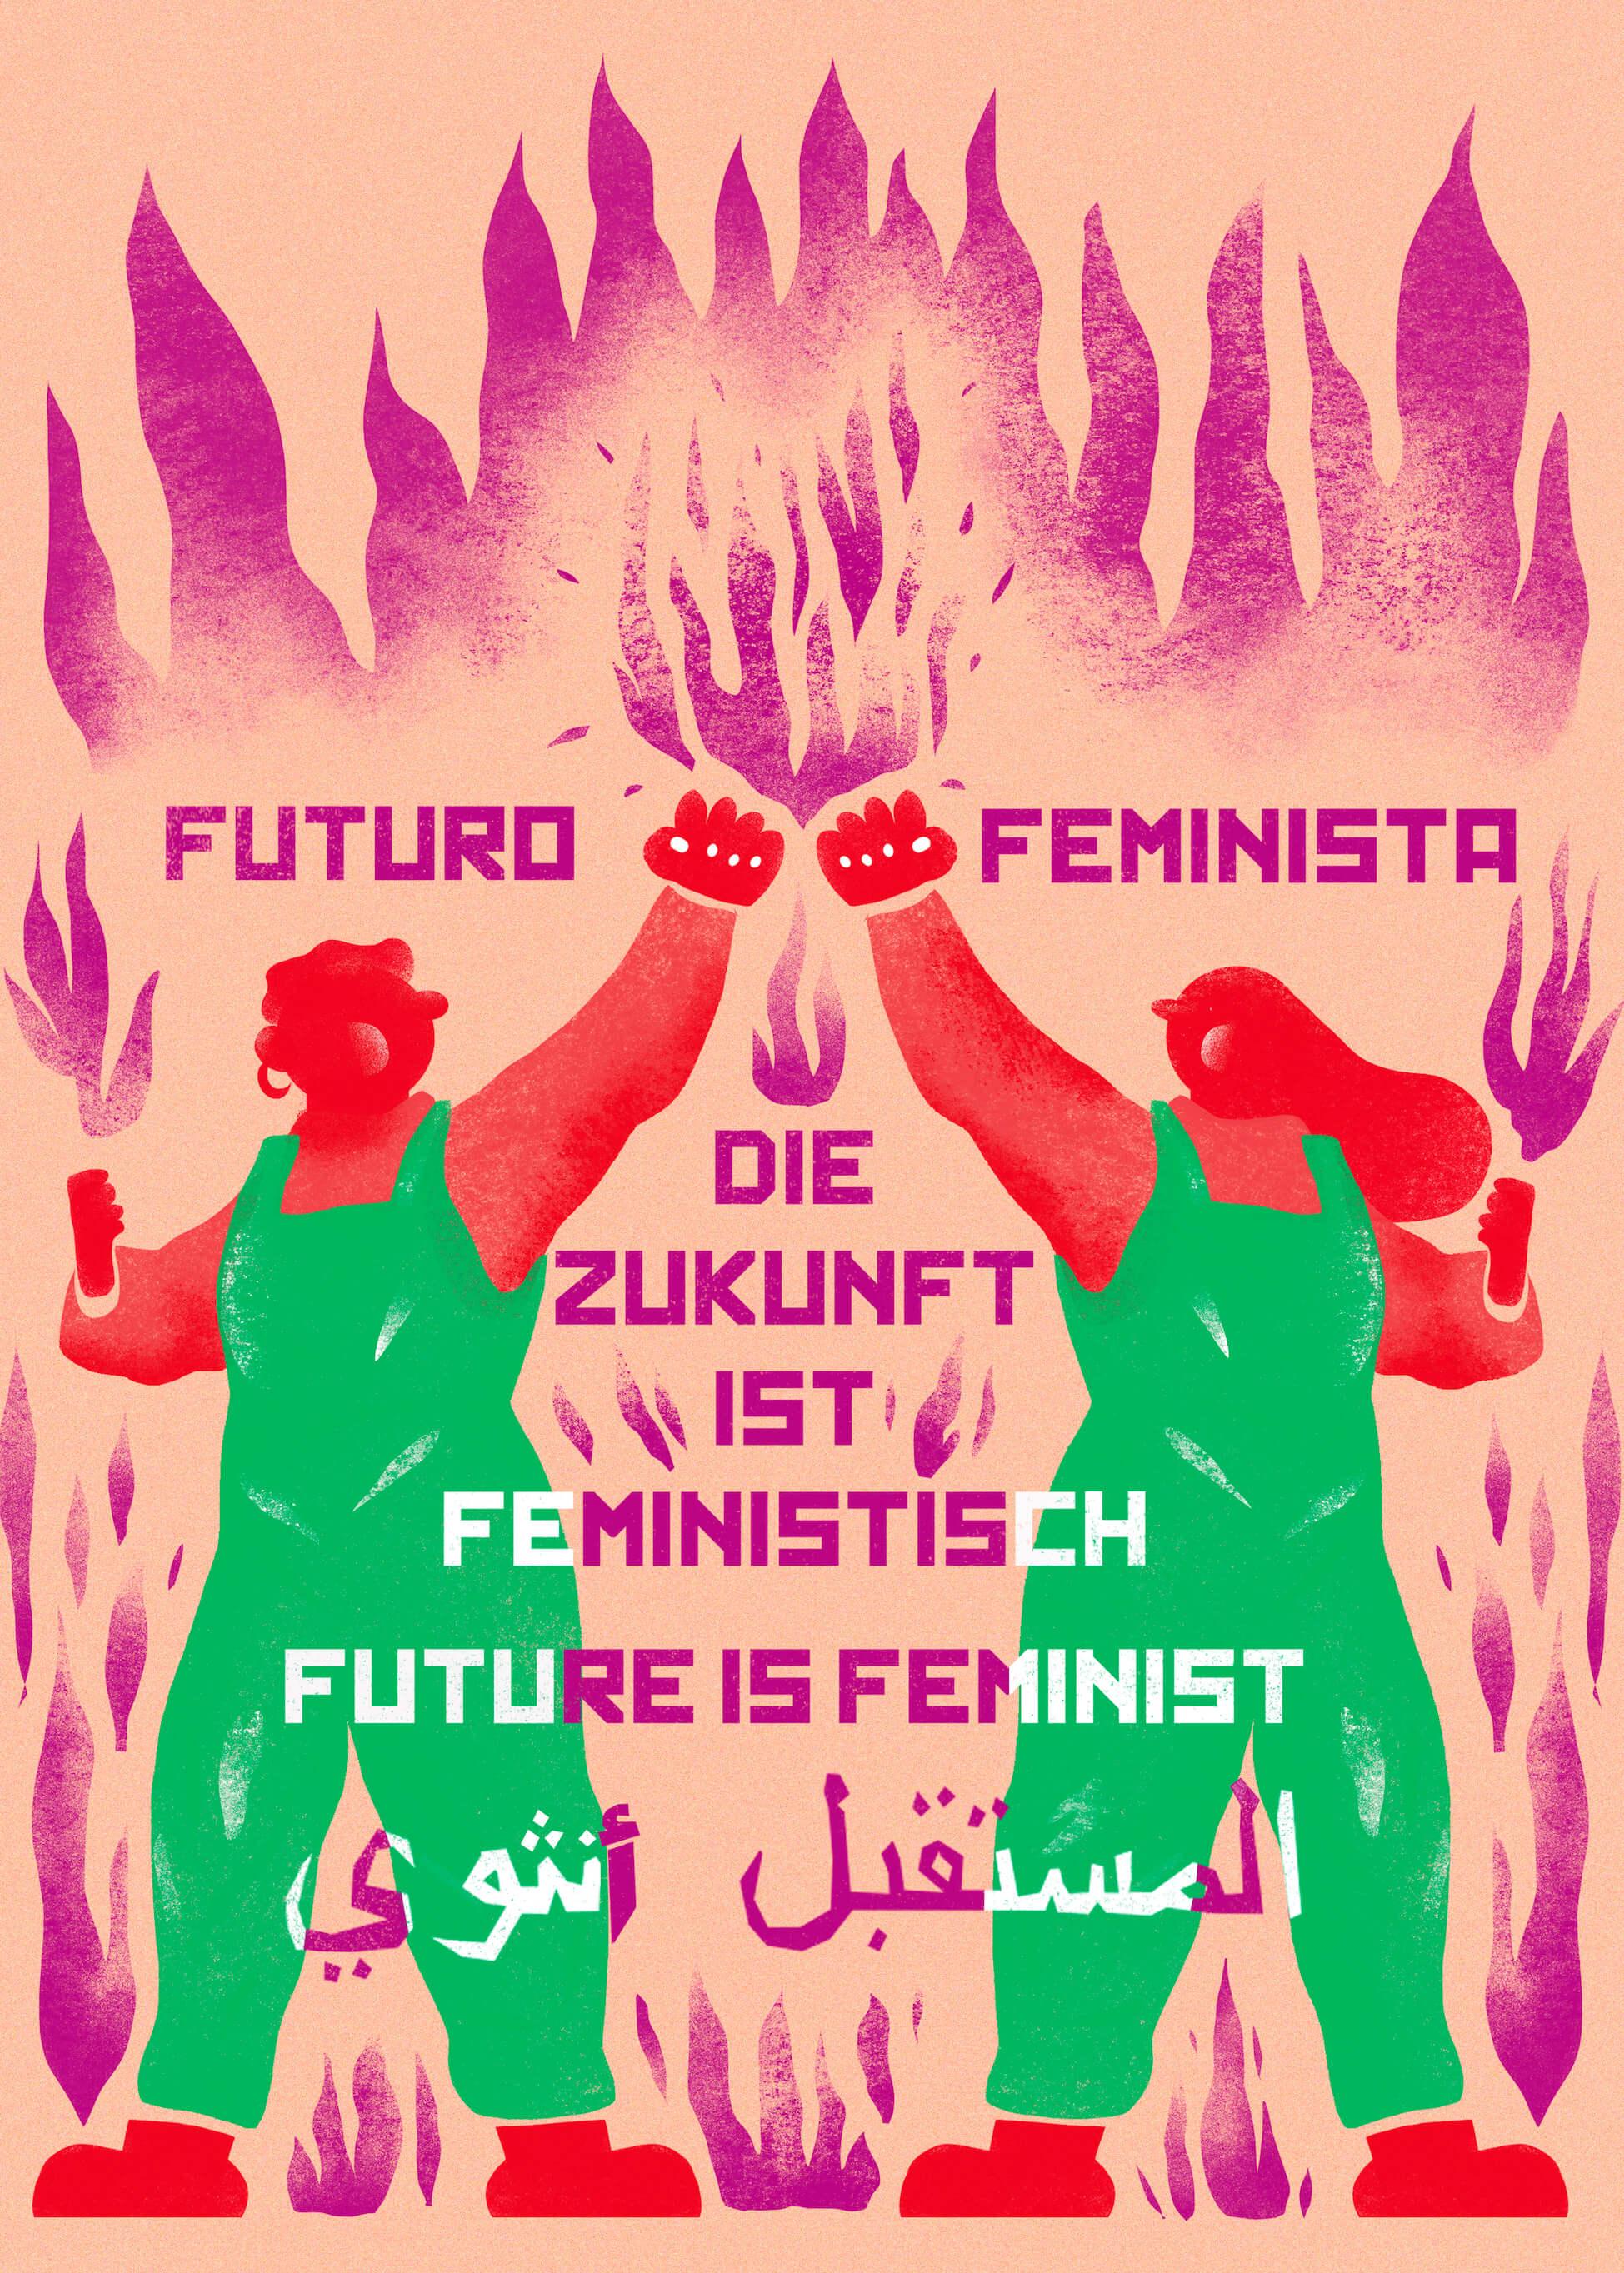 The Future Is Feminist main image